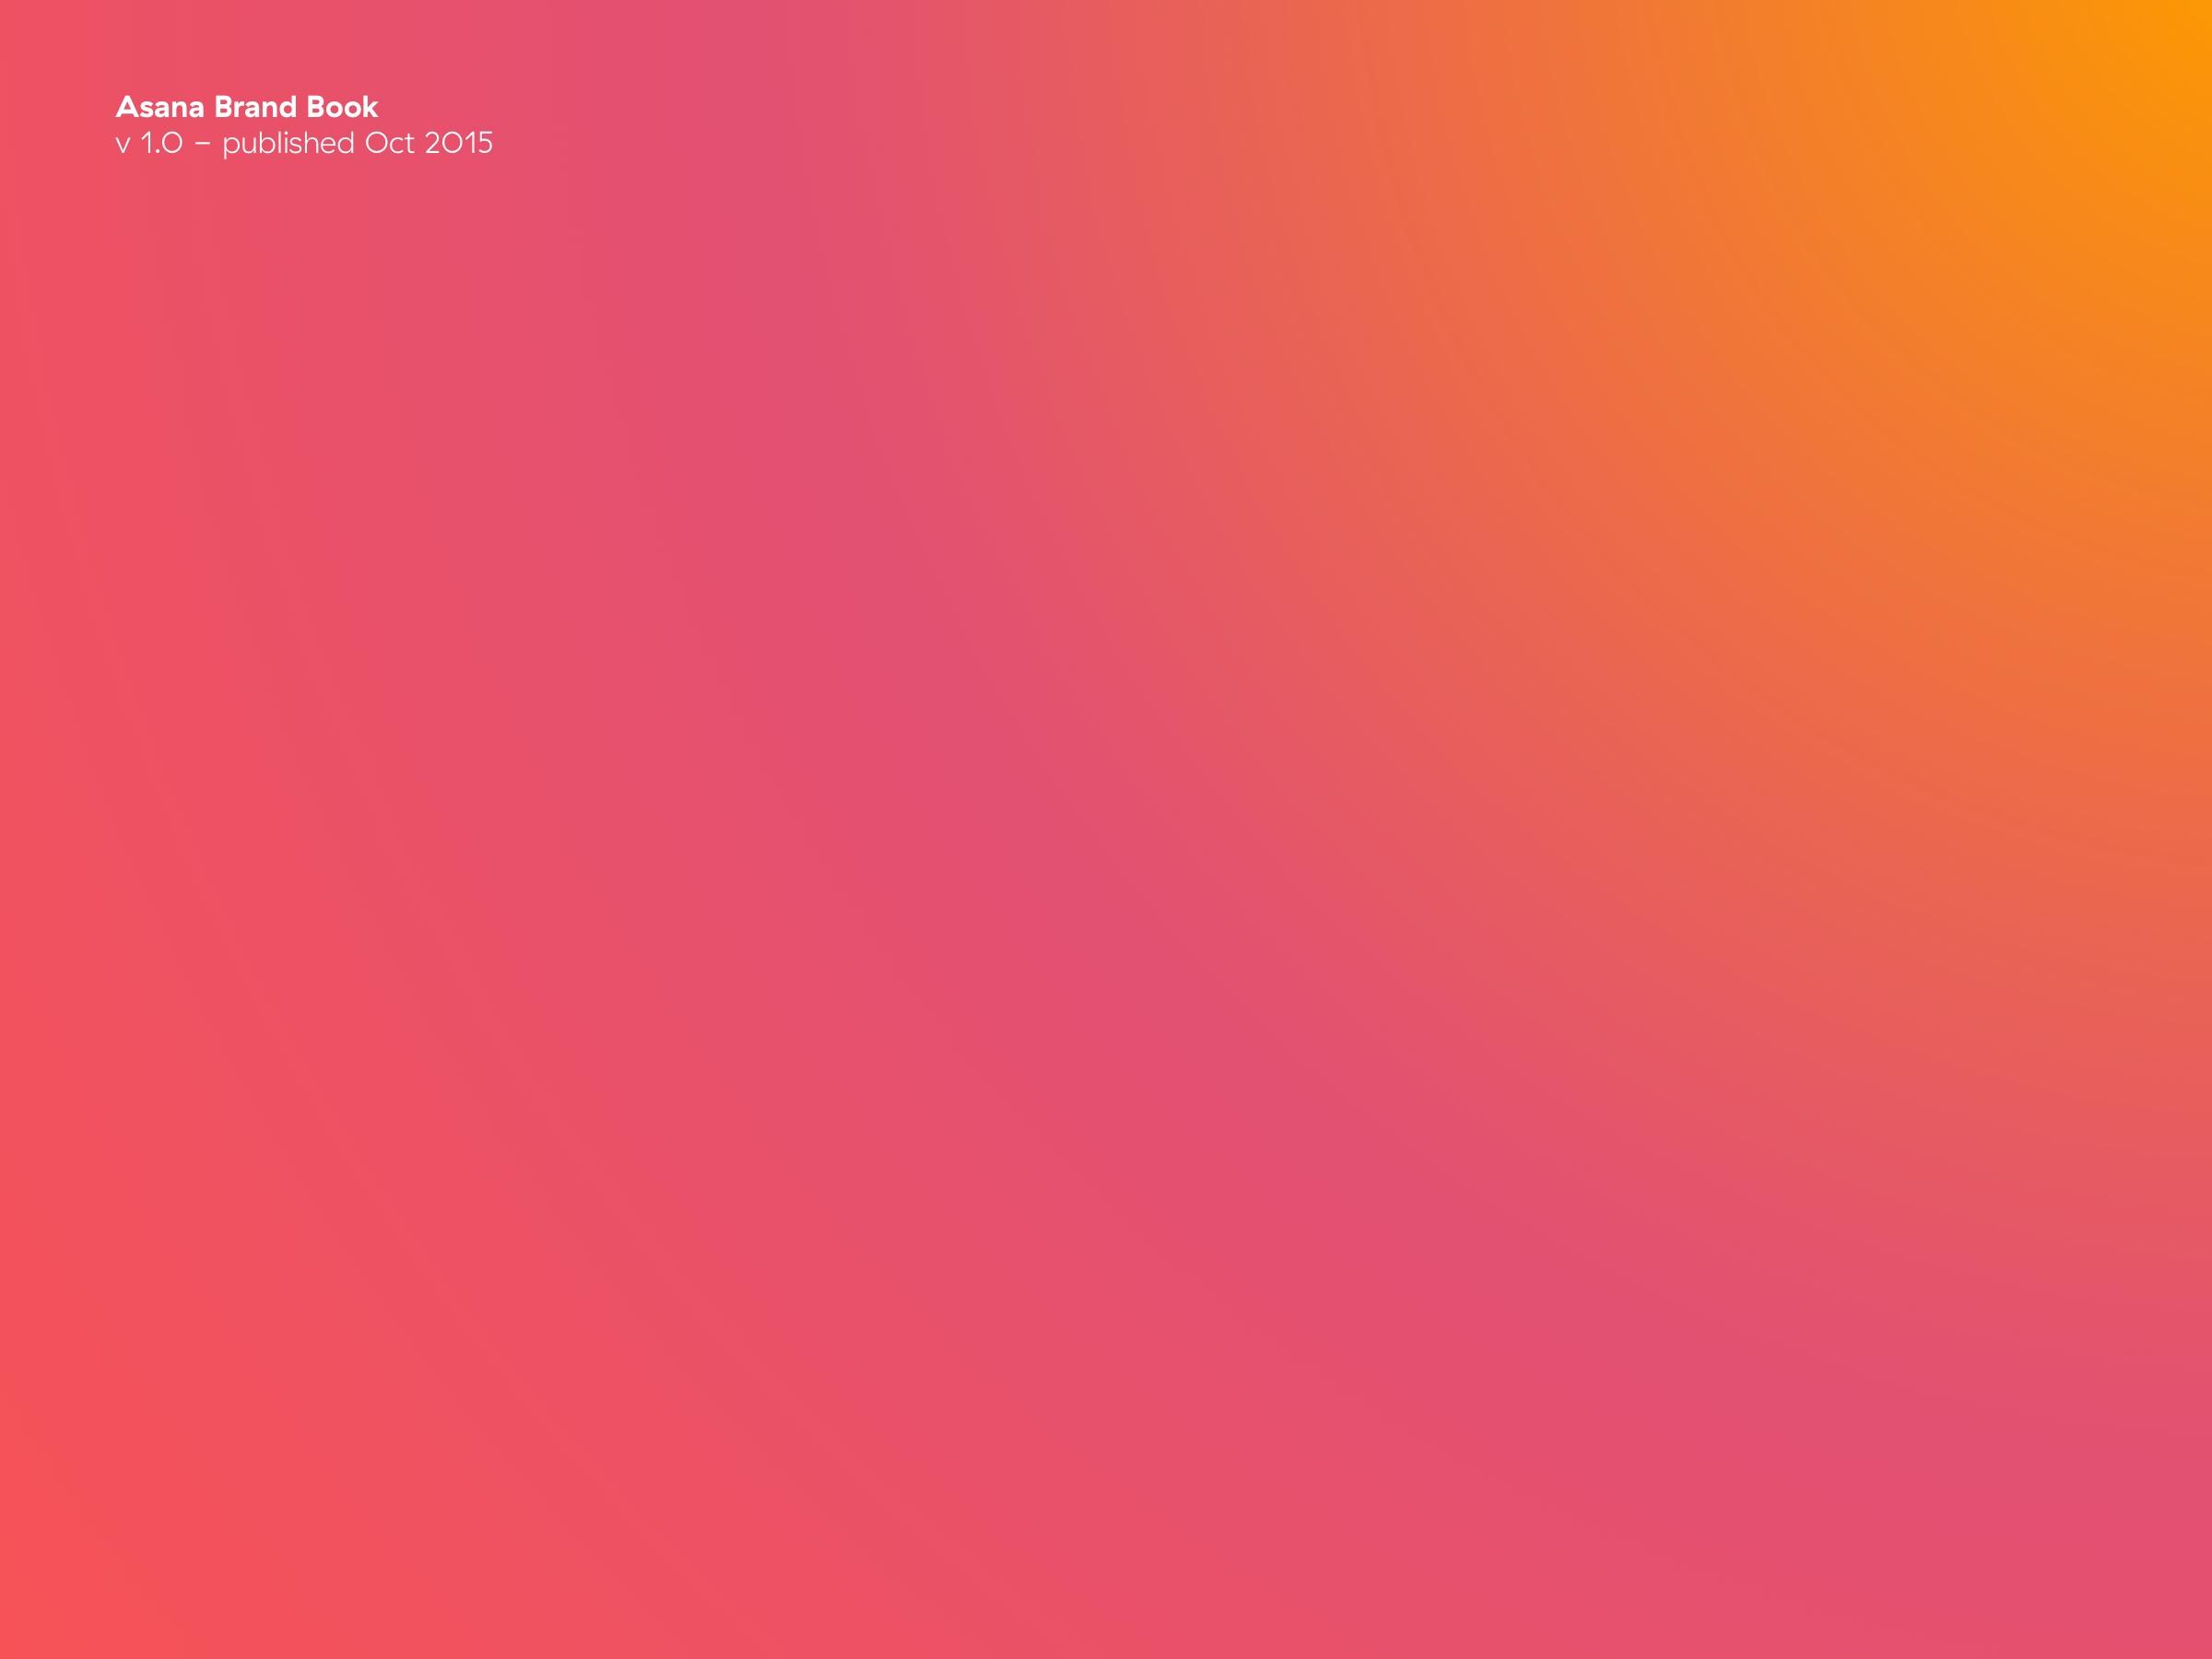 Asana-Brandbook-v1b 41.jpeg